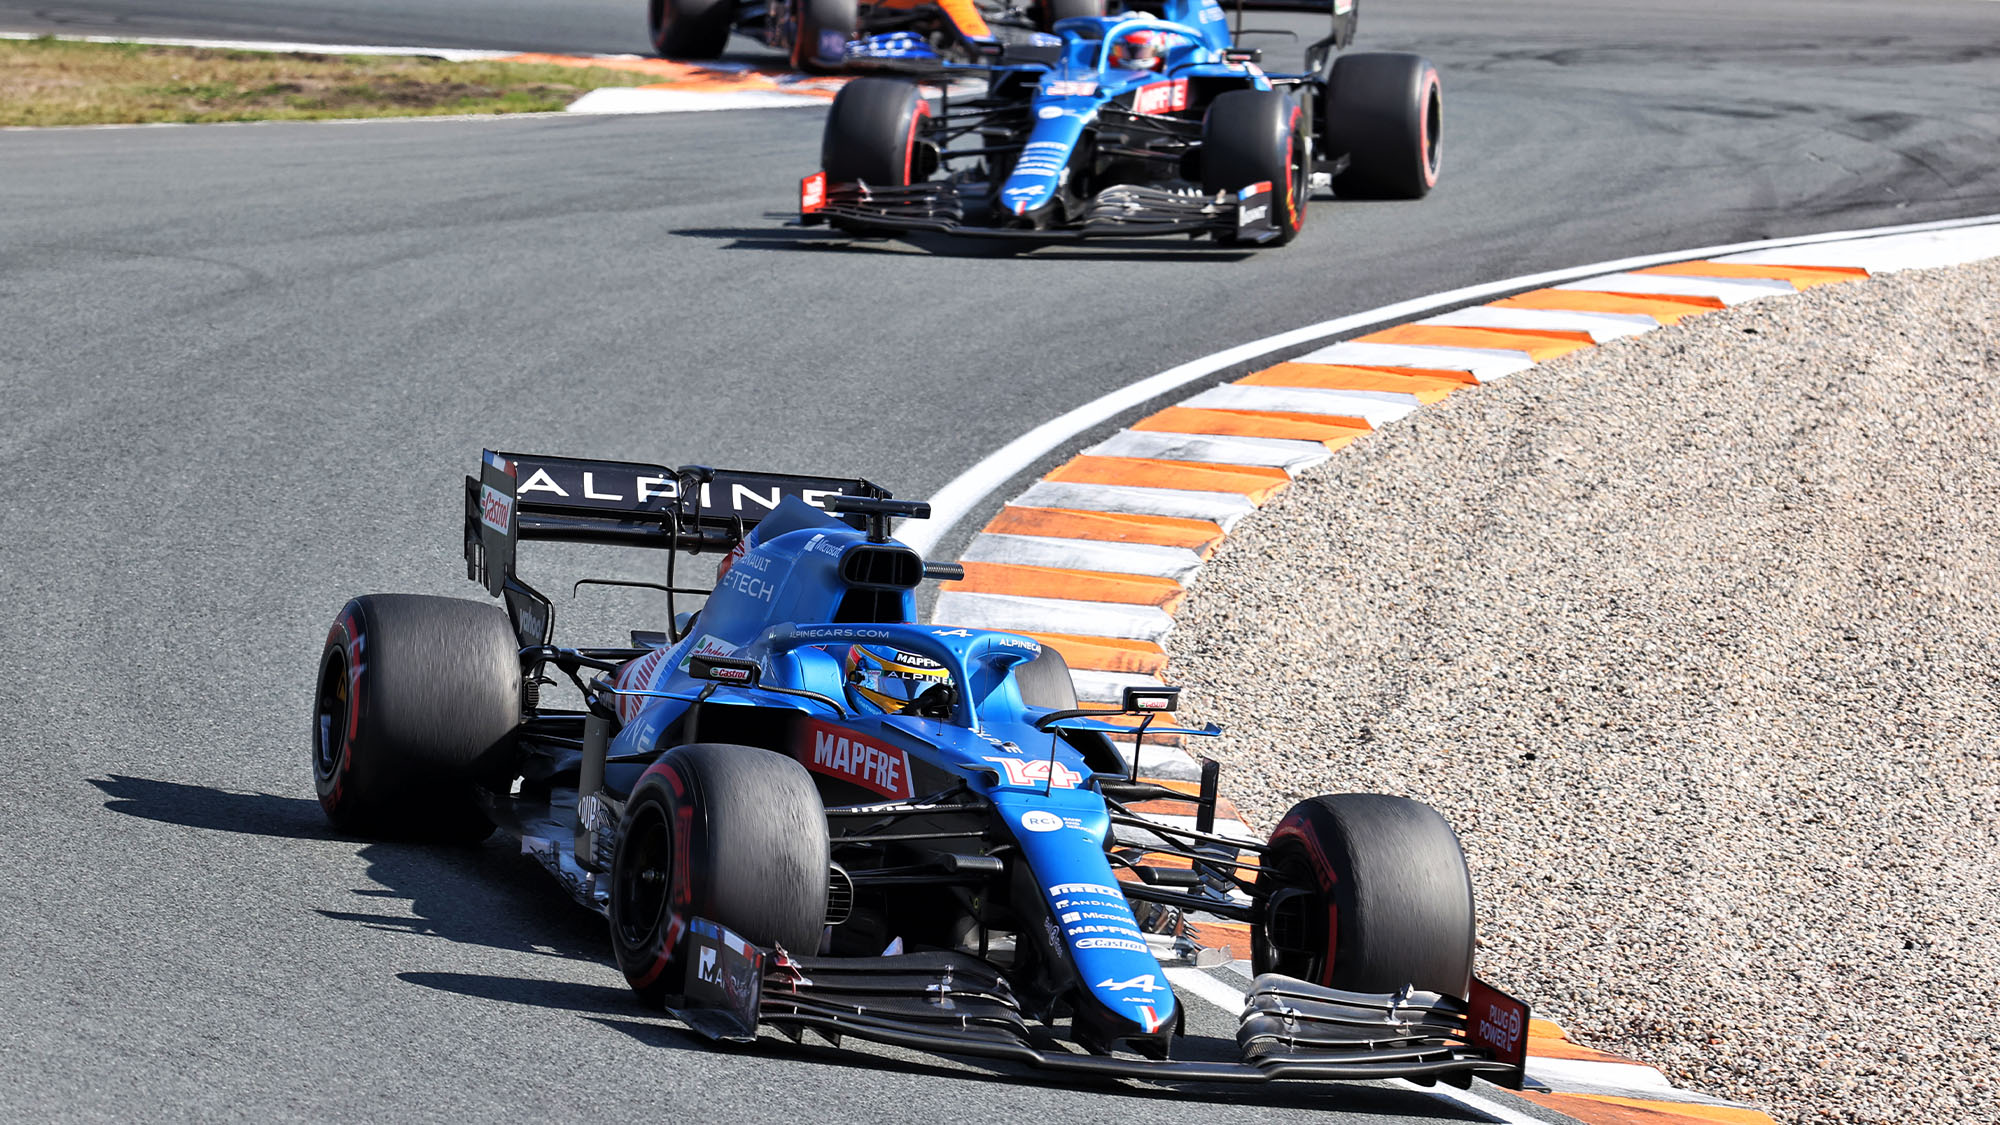 Alonso line